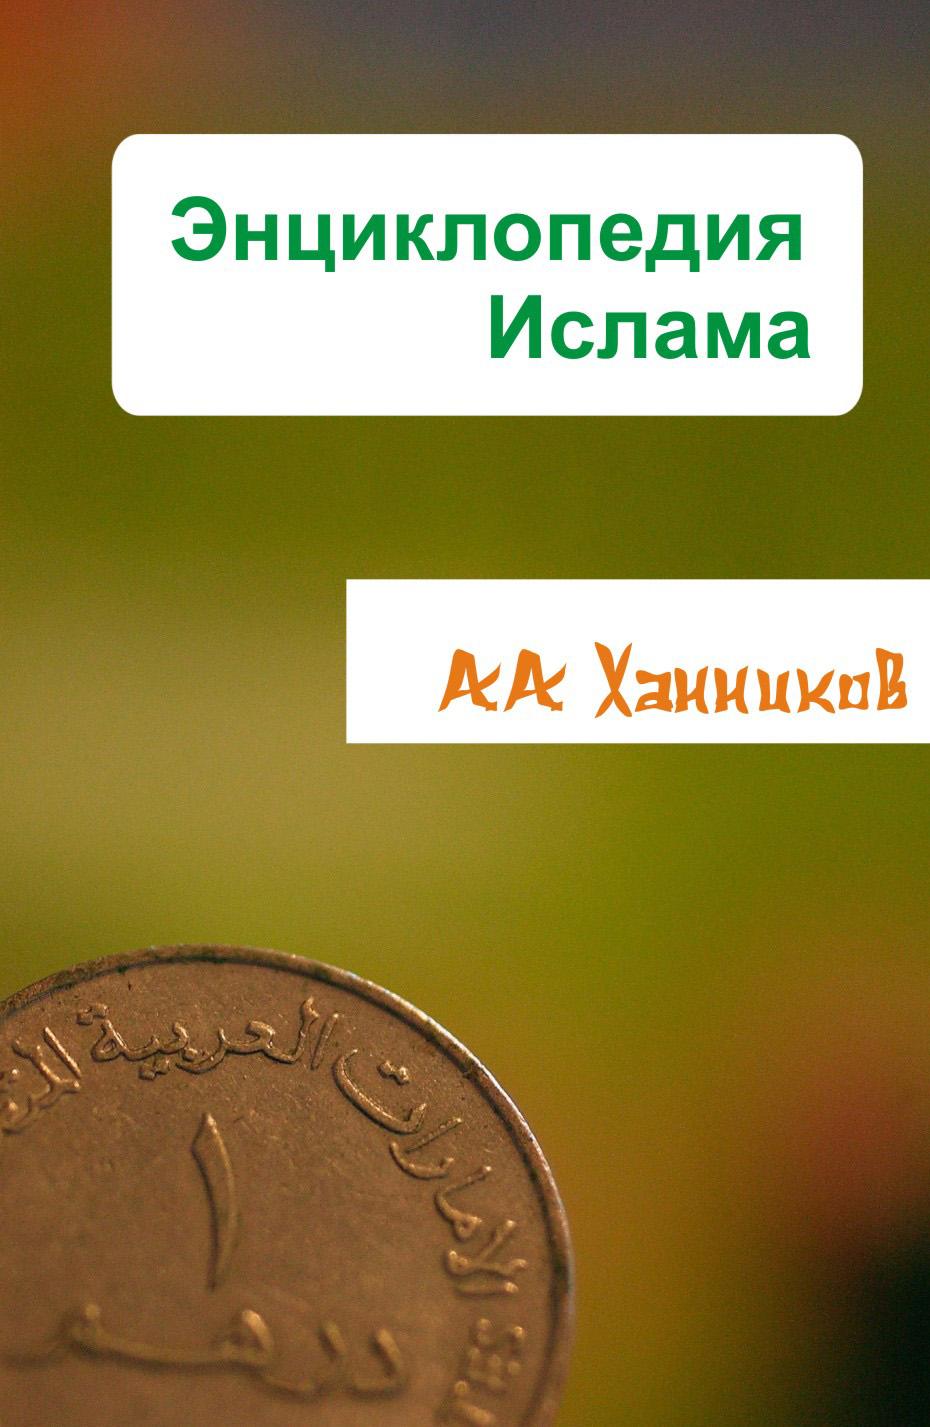 все цены на Александр Ханников Энциклопедия ислама онлайн